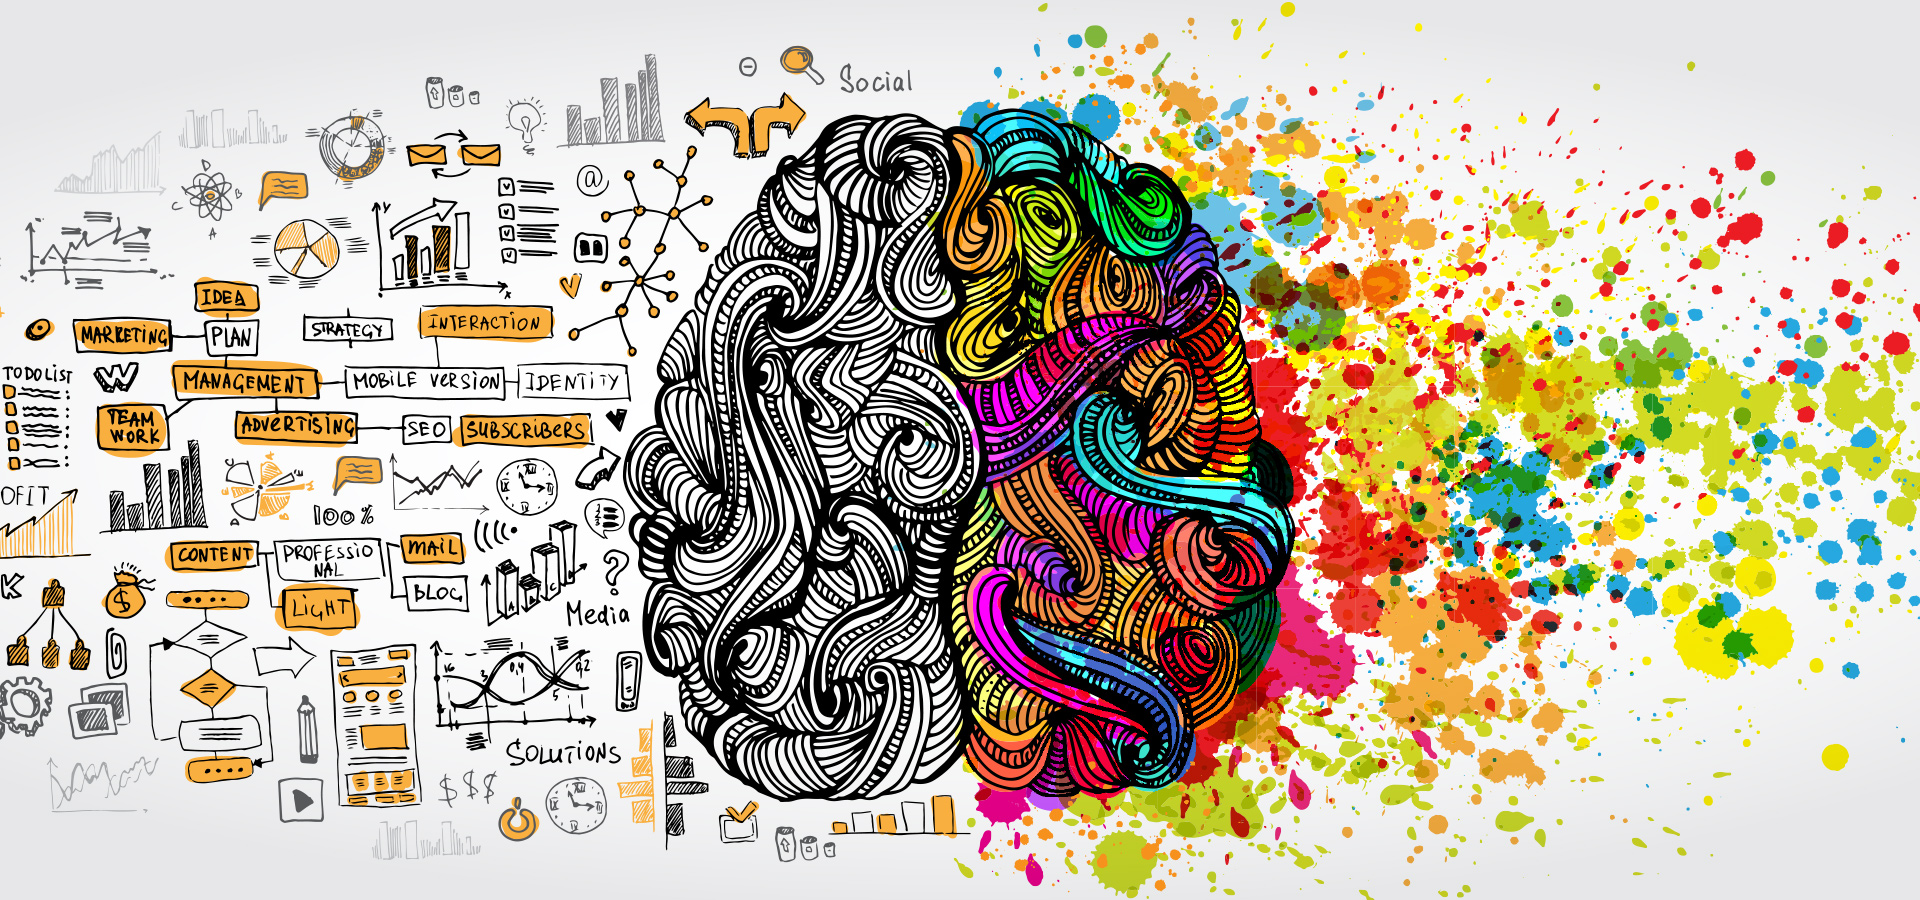 Imagination and Innovation